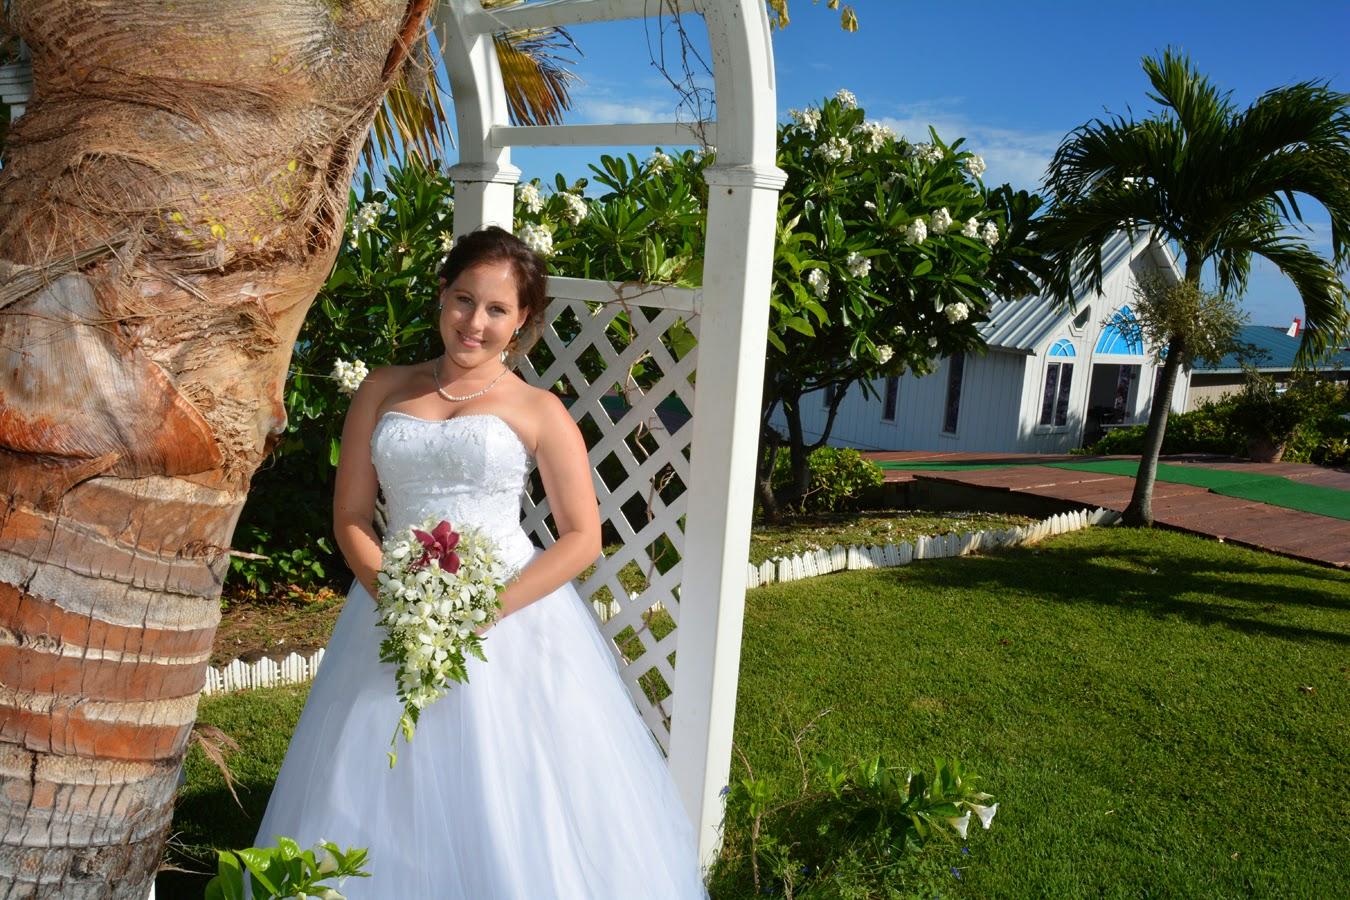 Hawaii Wedding Chapel: Bride Photos